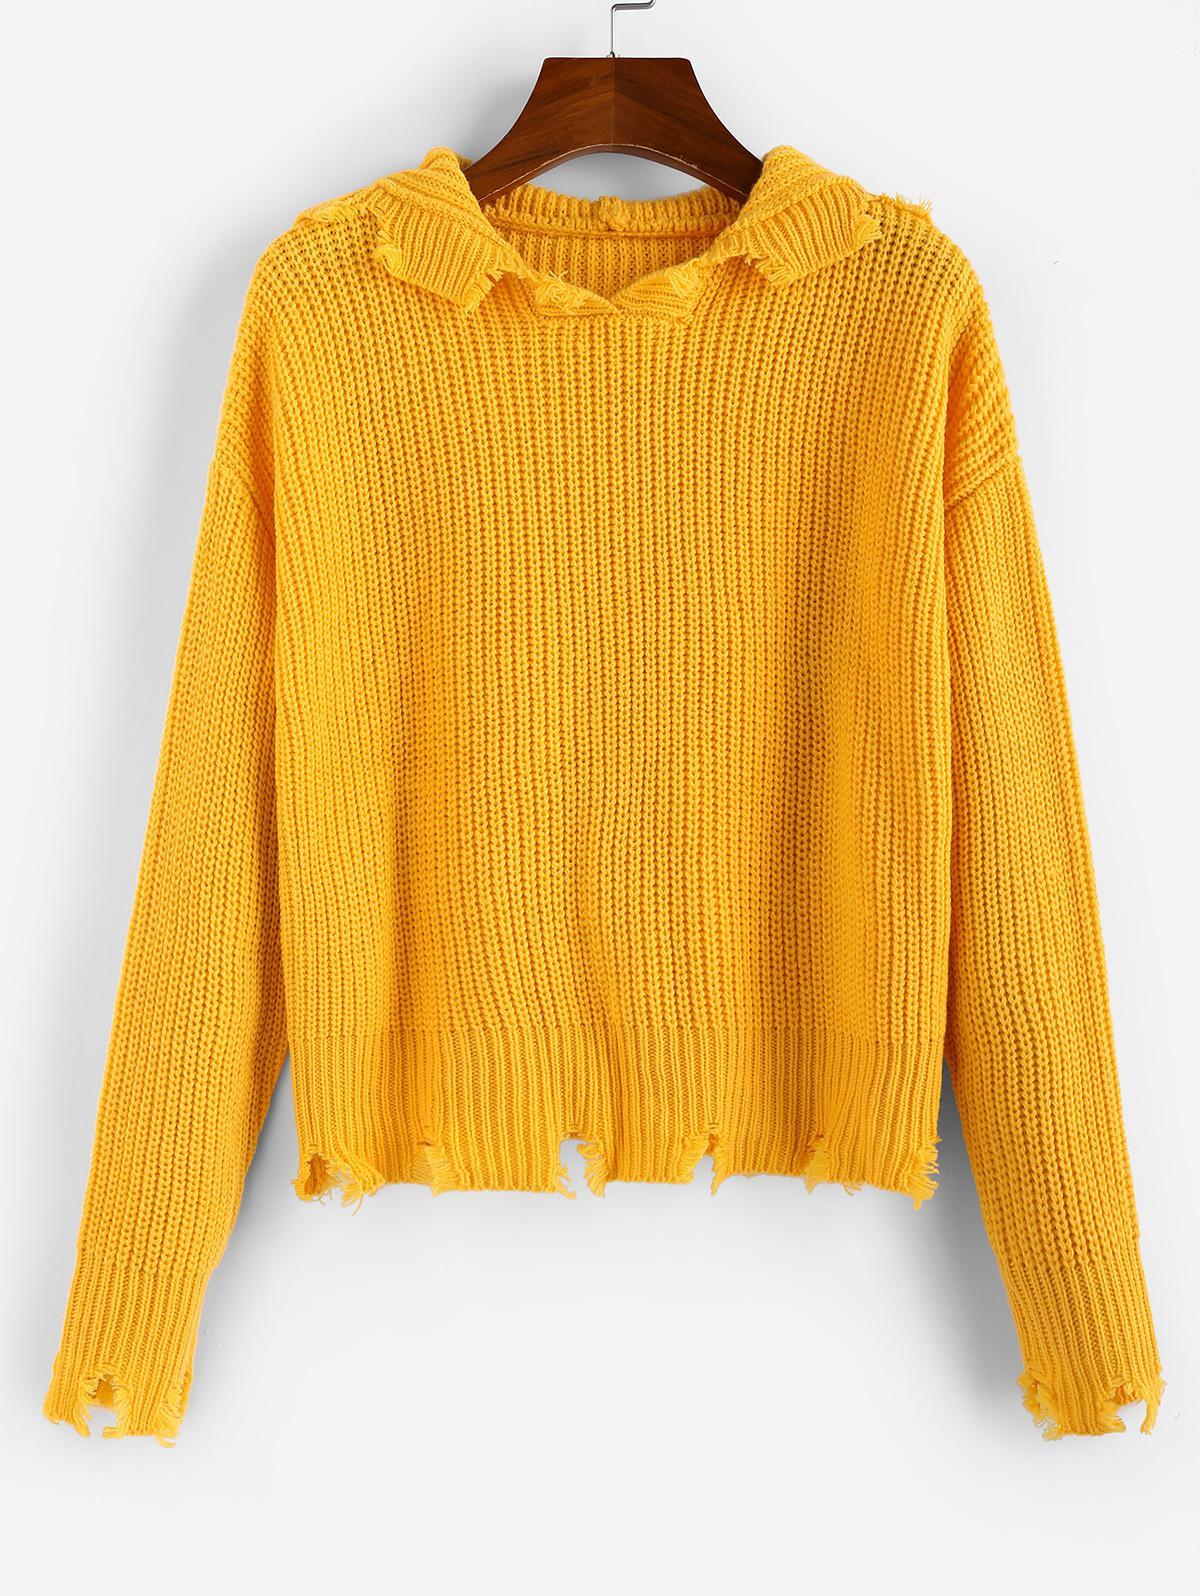 ZAFUL Ripped Hooded Drop Shoulder Jumper Sweater